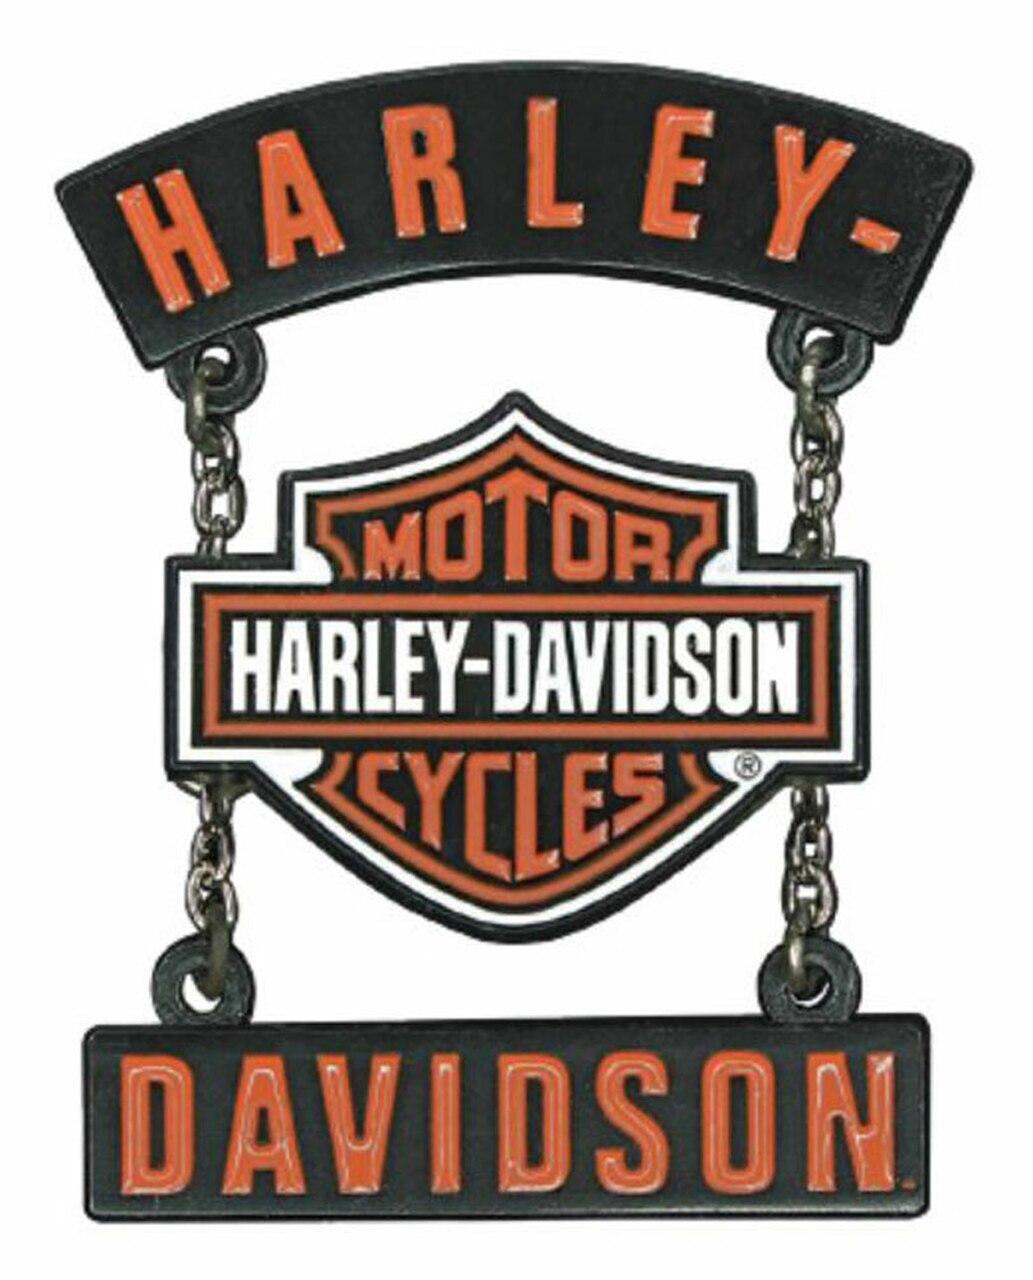 HARLEY DAVIDSON PIN, H-D B&S ROCKERS, 3D DIE CAST W/ SILVER CHAINS, SPRAY